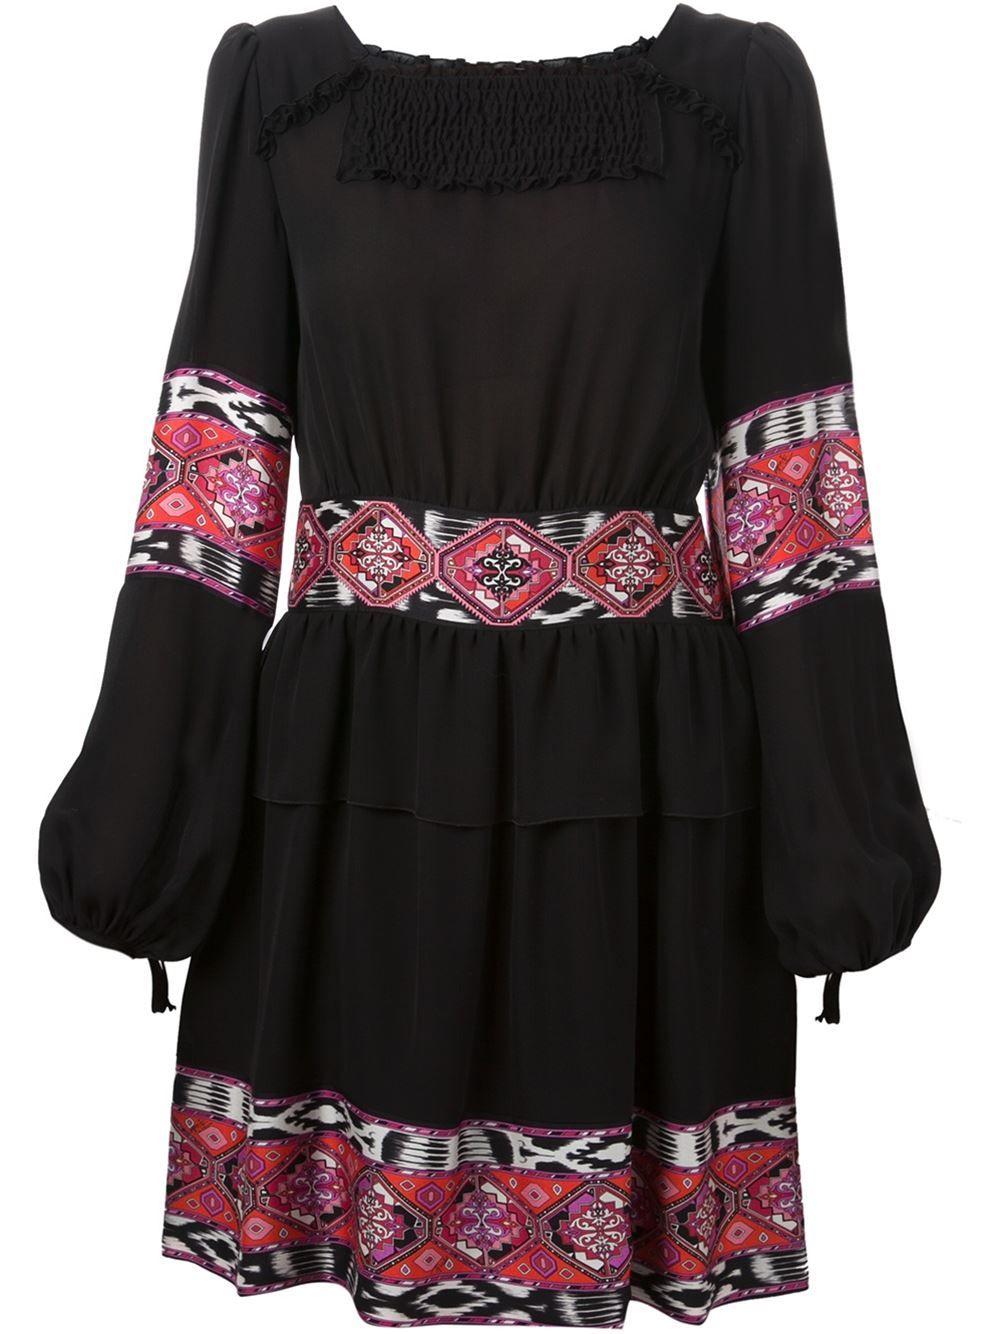 Emilio Pucci Ruffled Suzani Dress - Elite - Farfetch.com